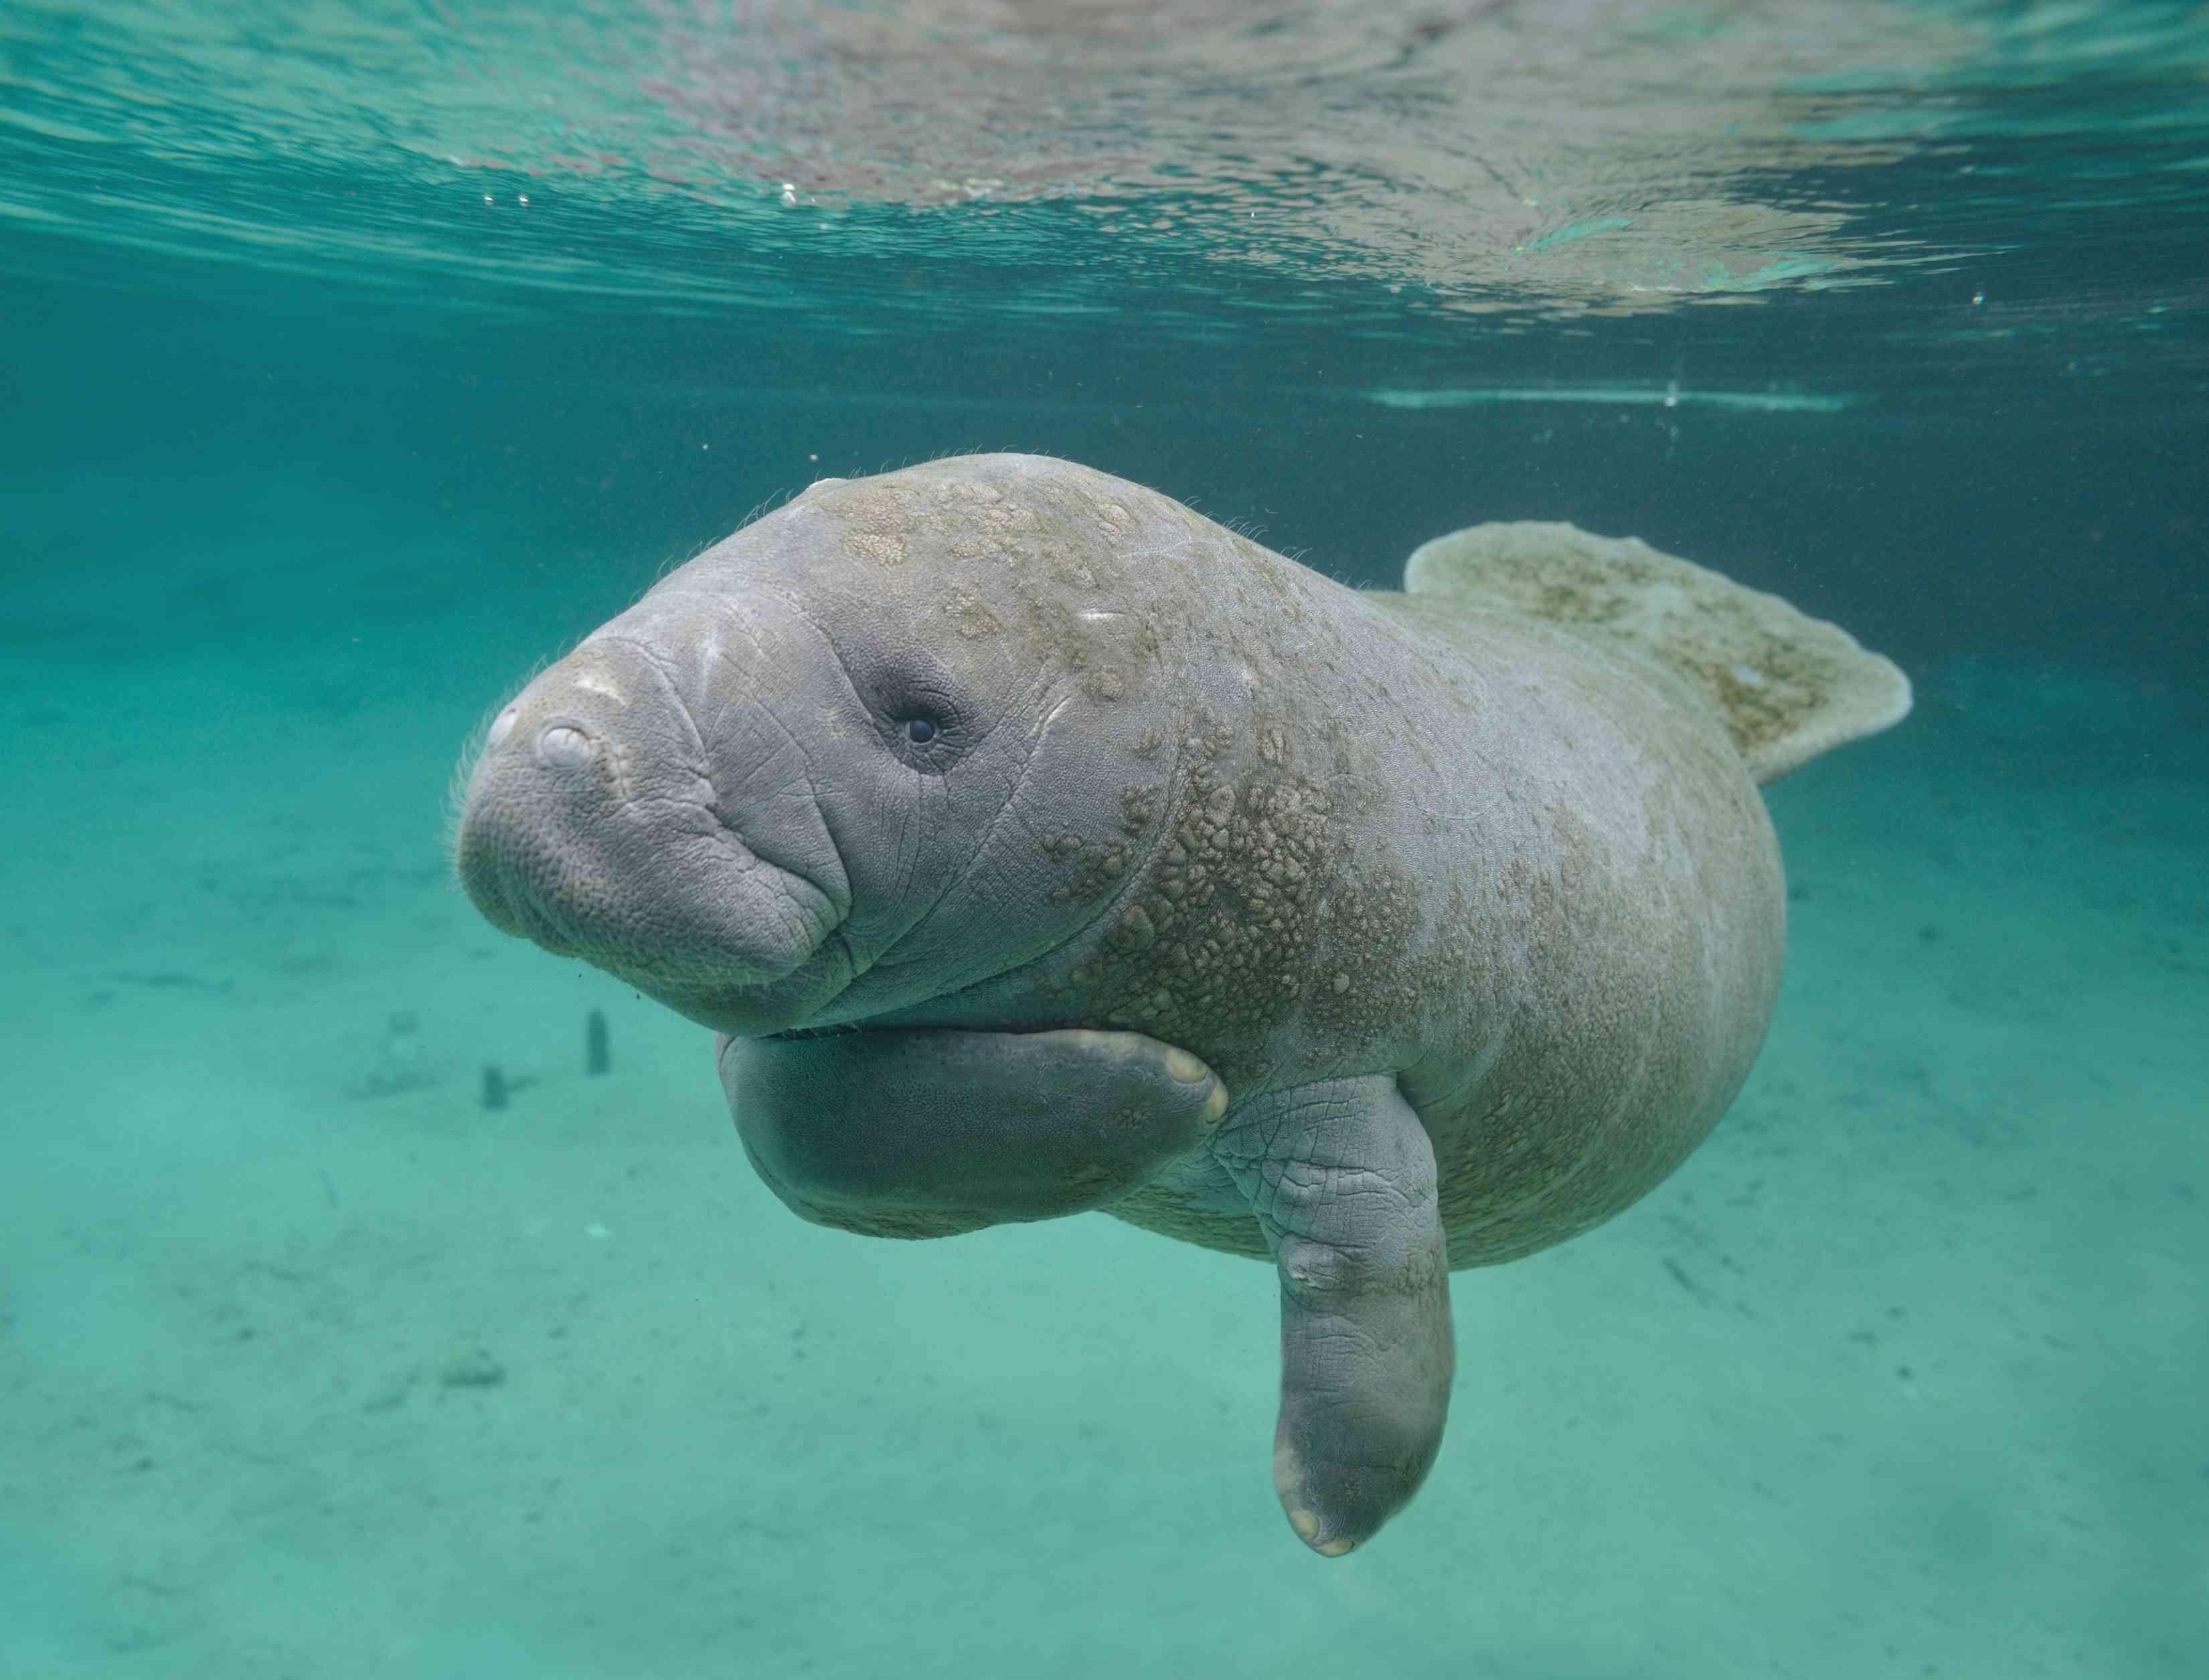 chubby gray manatee touches body while swimming underwater